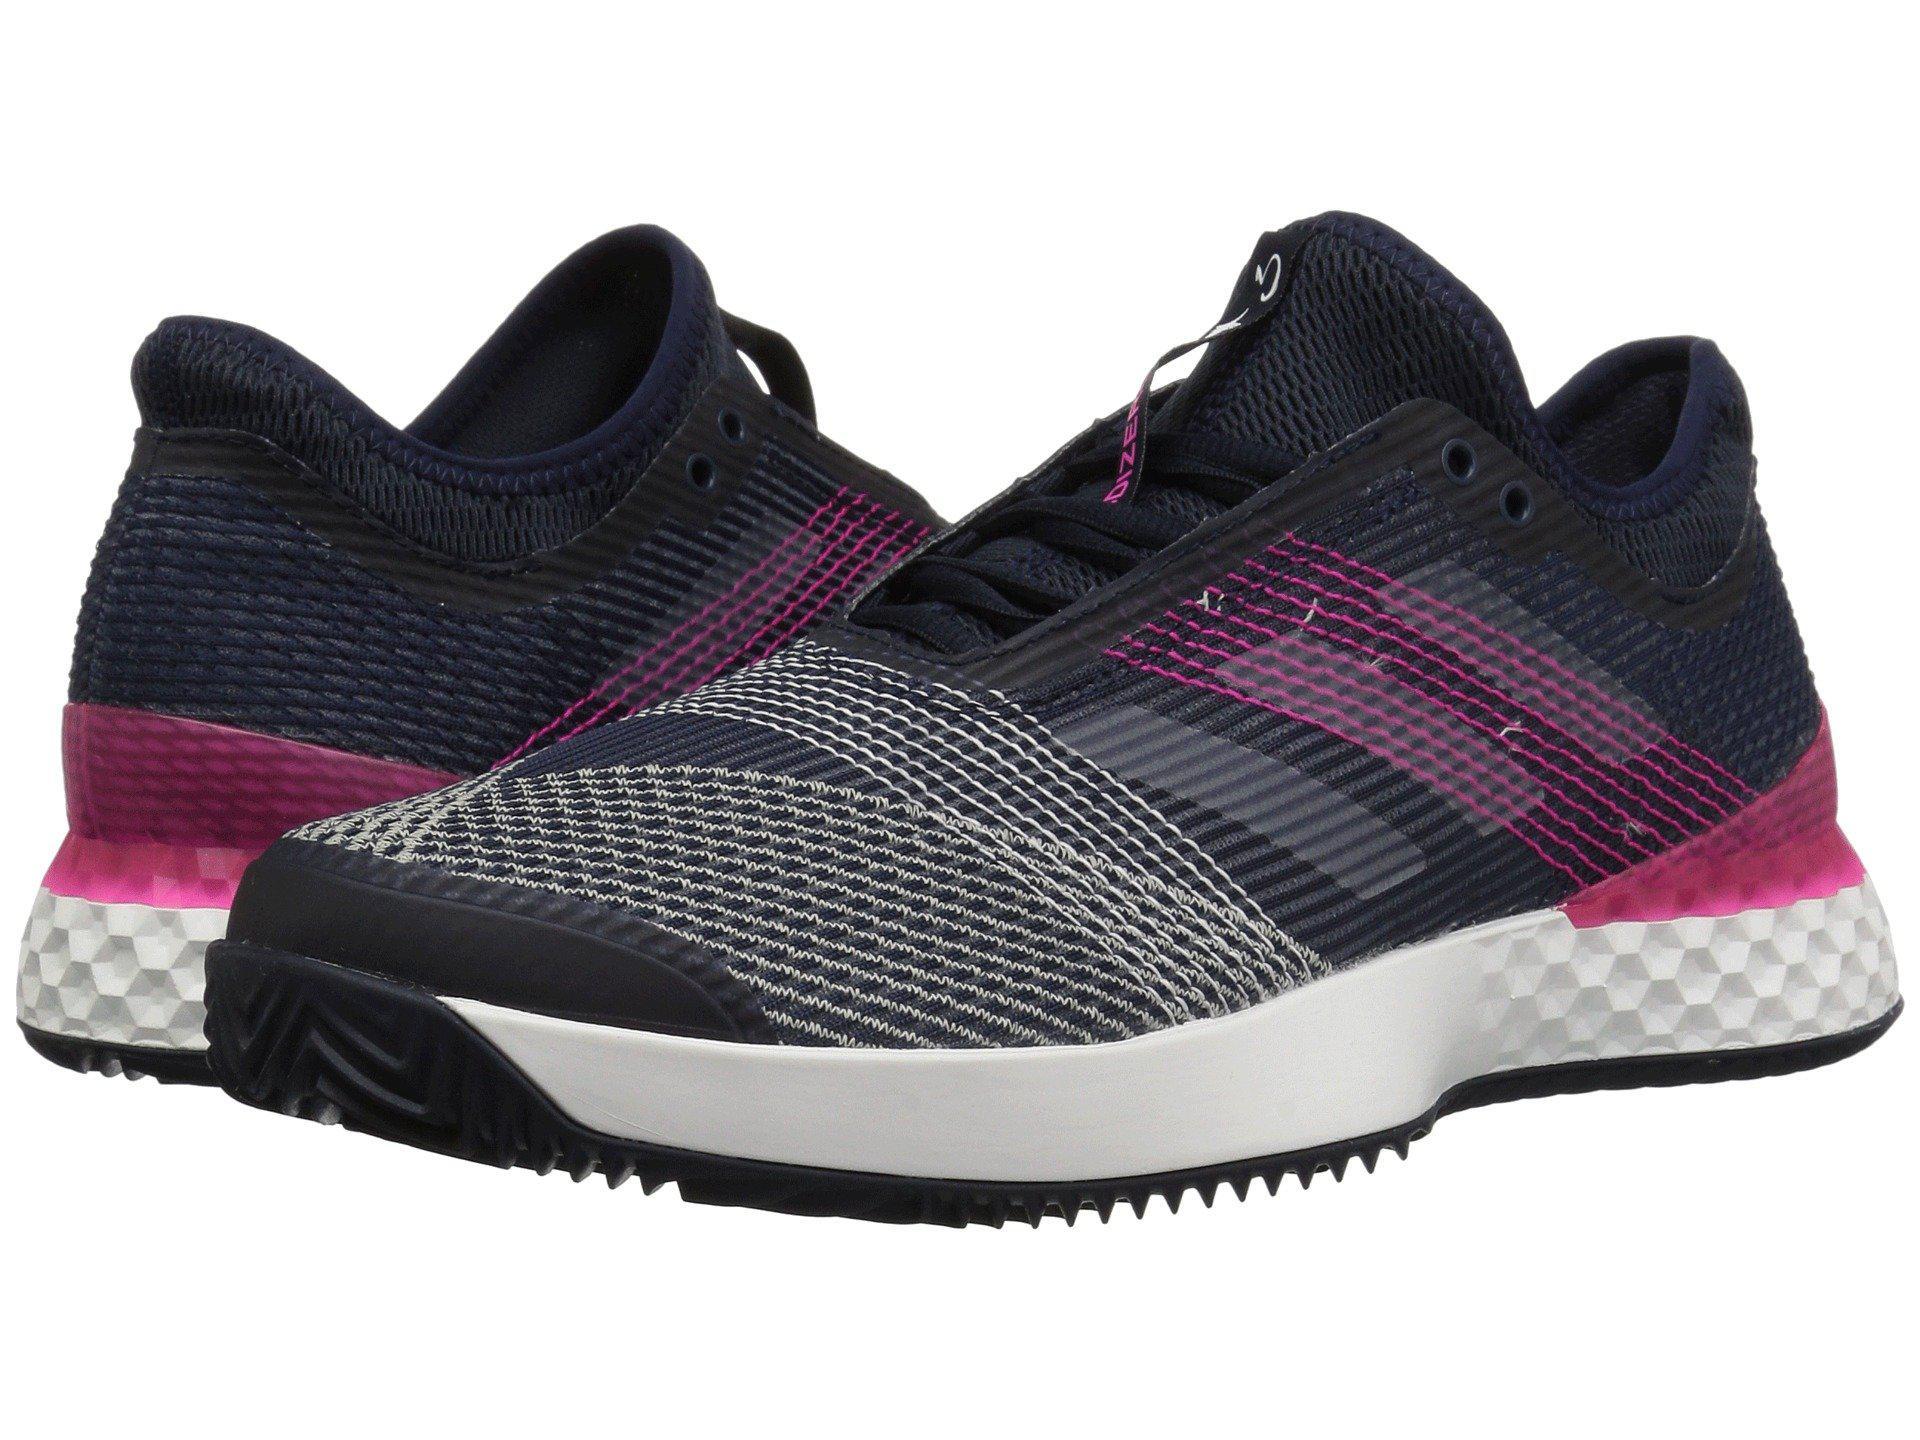 brand new e5be0 11499 adidas. Mens Blue Adizero Ubersonic 3 Clay